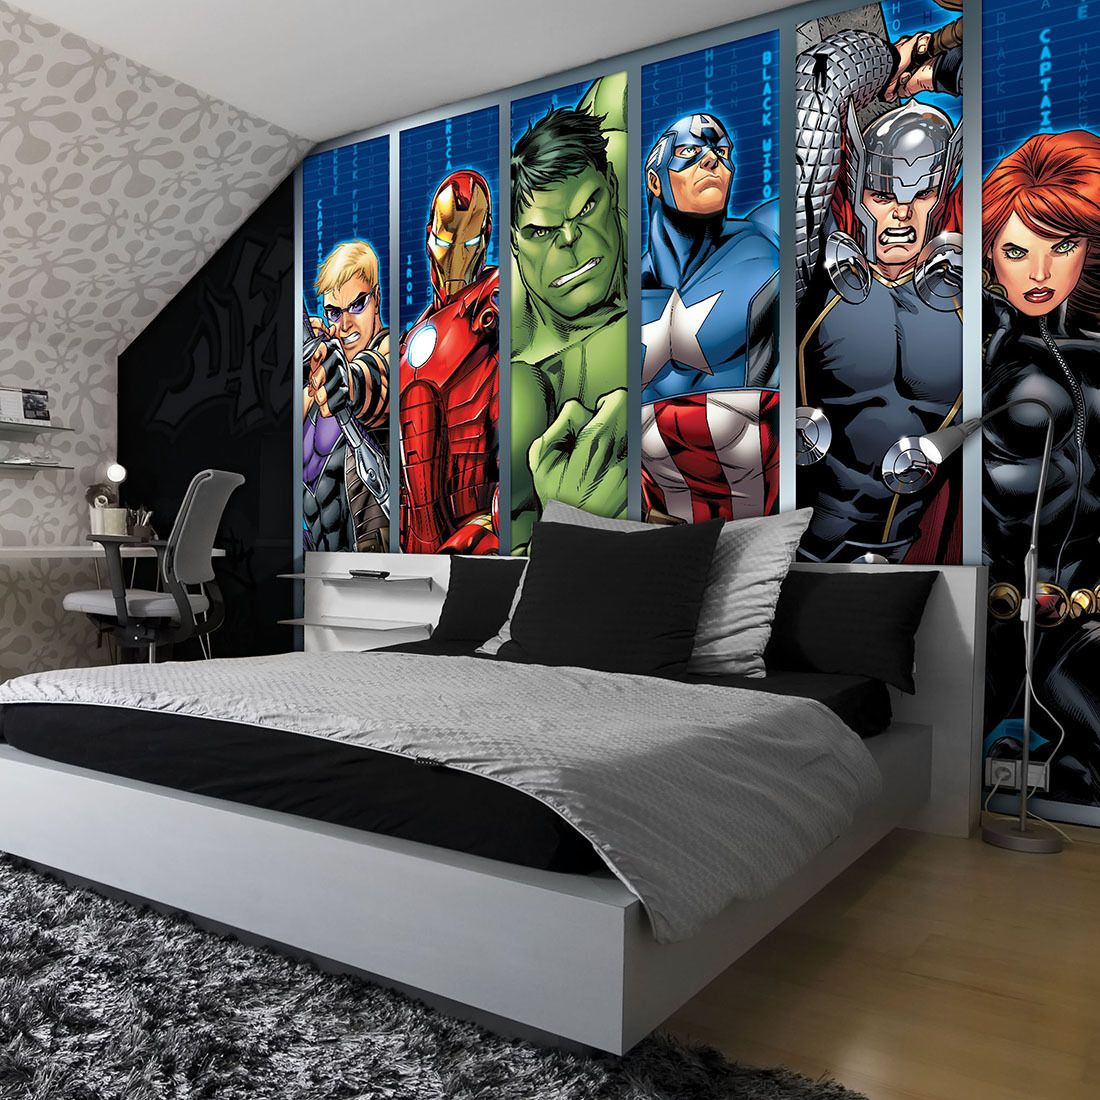 Marvel Avengers Teenagers Kids Photo Wallpaper Wall Mural Room